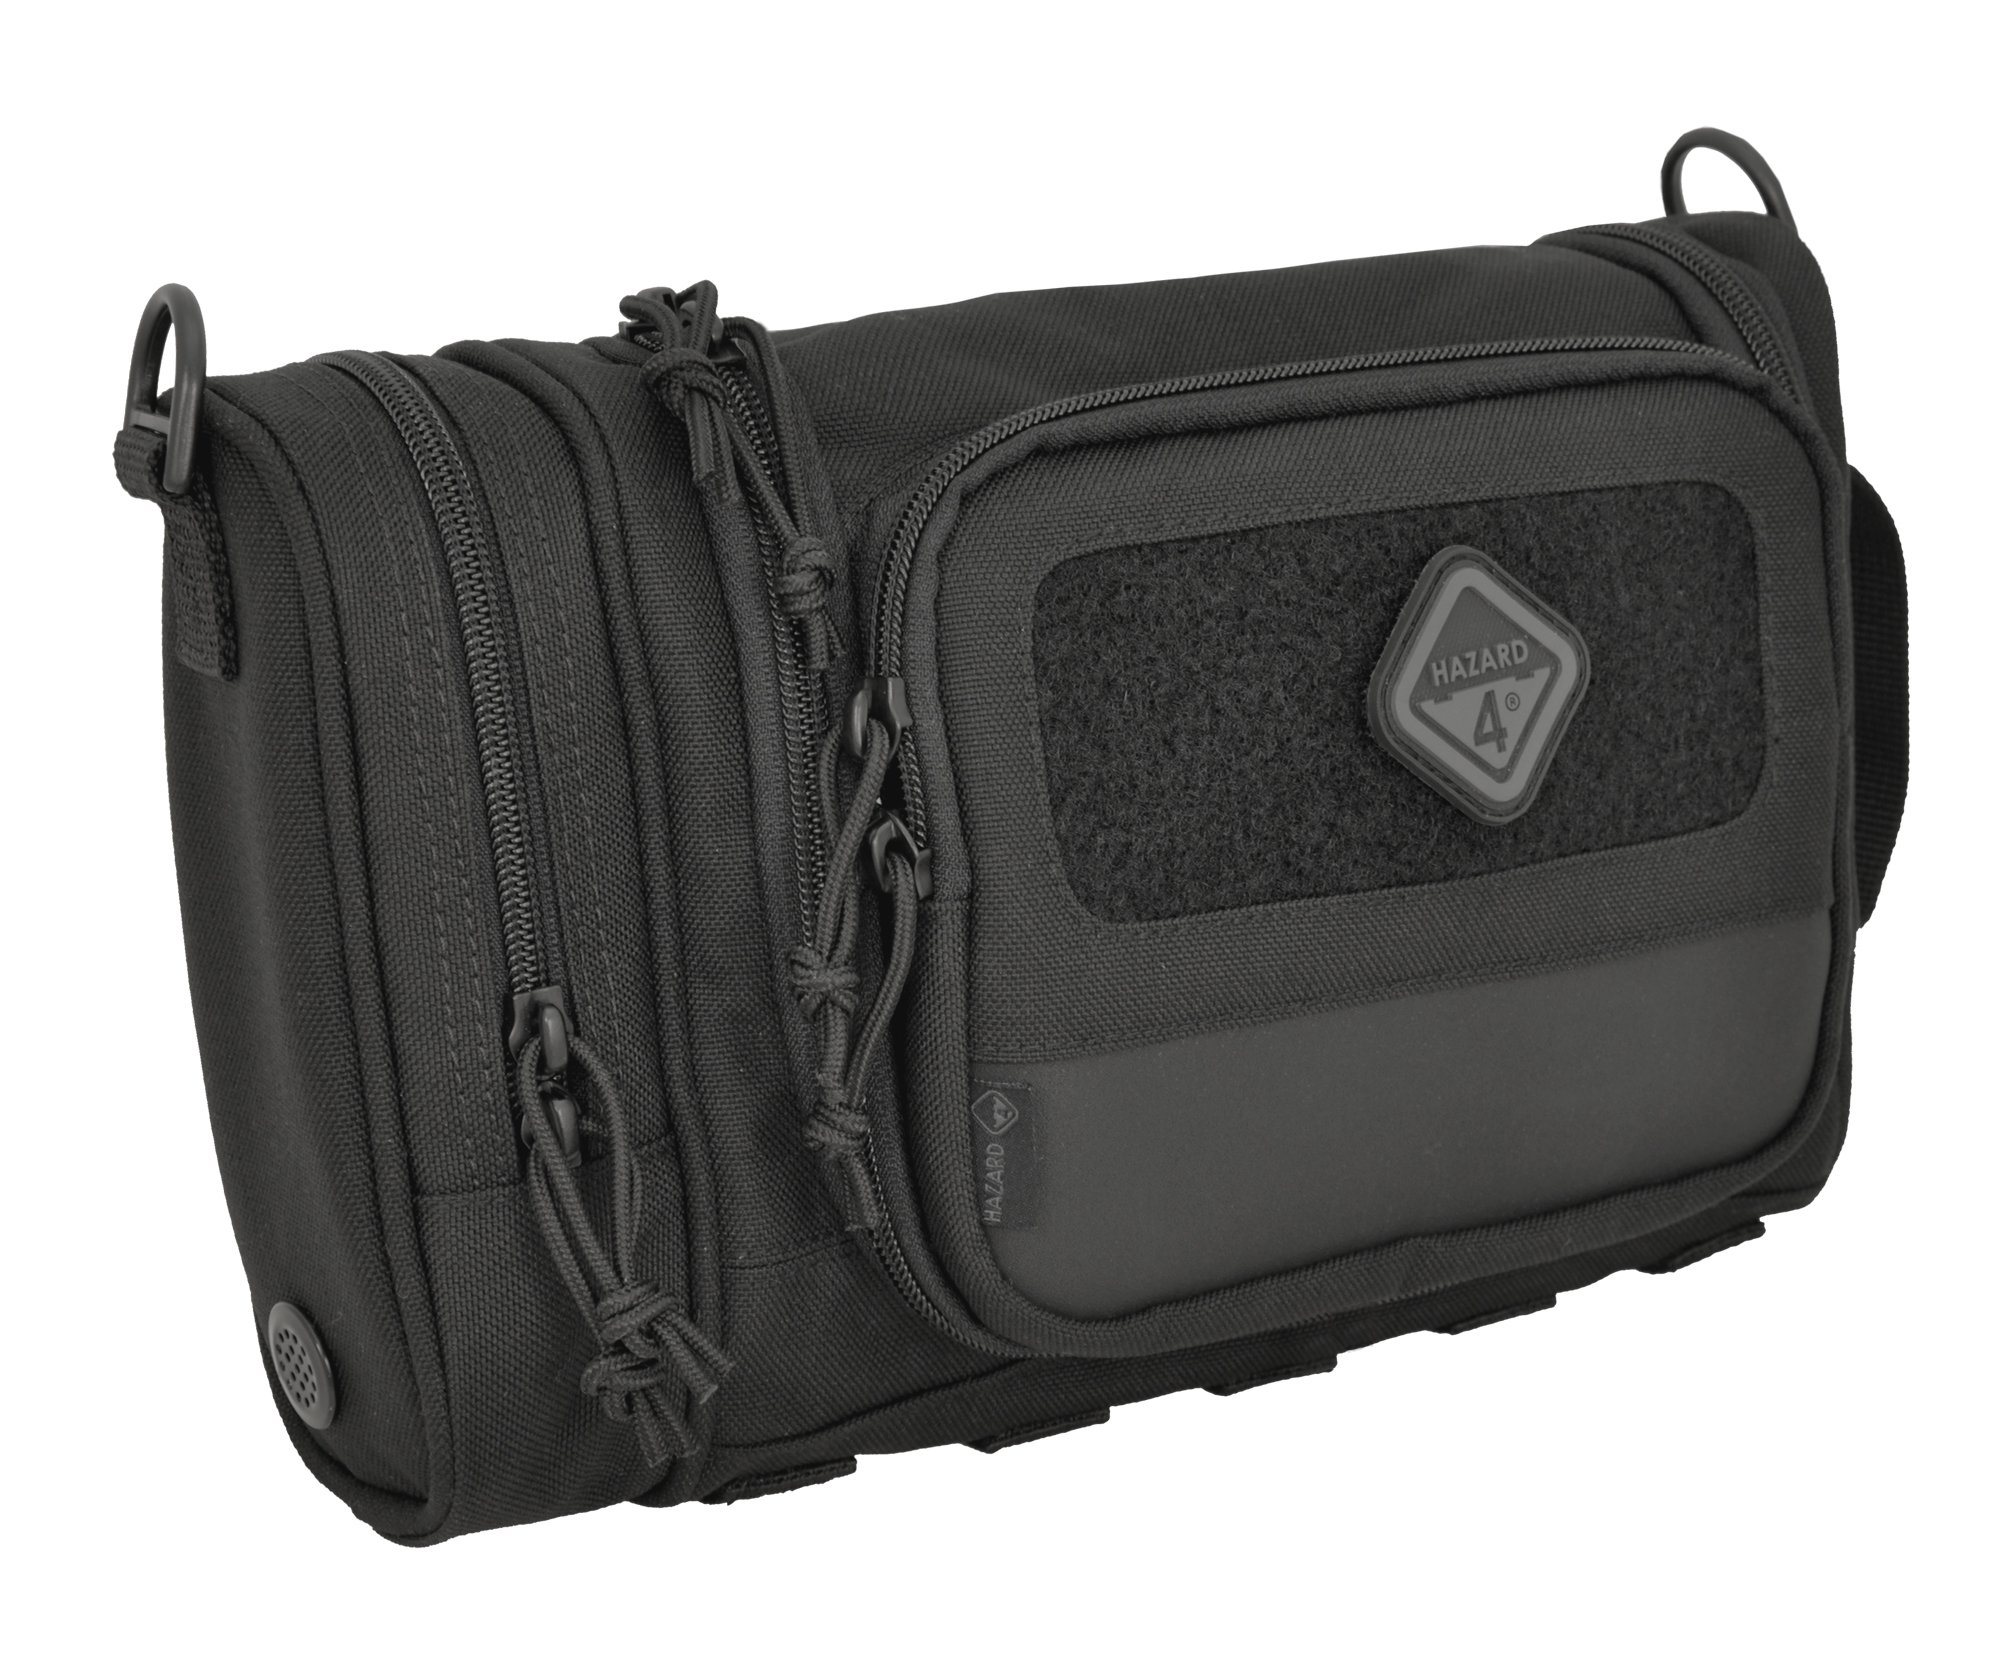 Hazard 4 (RVL-CRD-BLK) Reveille Rugged Grooming Kit/Heavy-Duty Toiletry Bag, Black by HAZARD 4